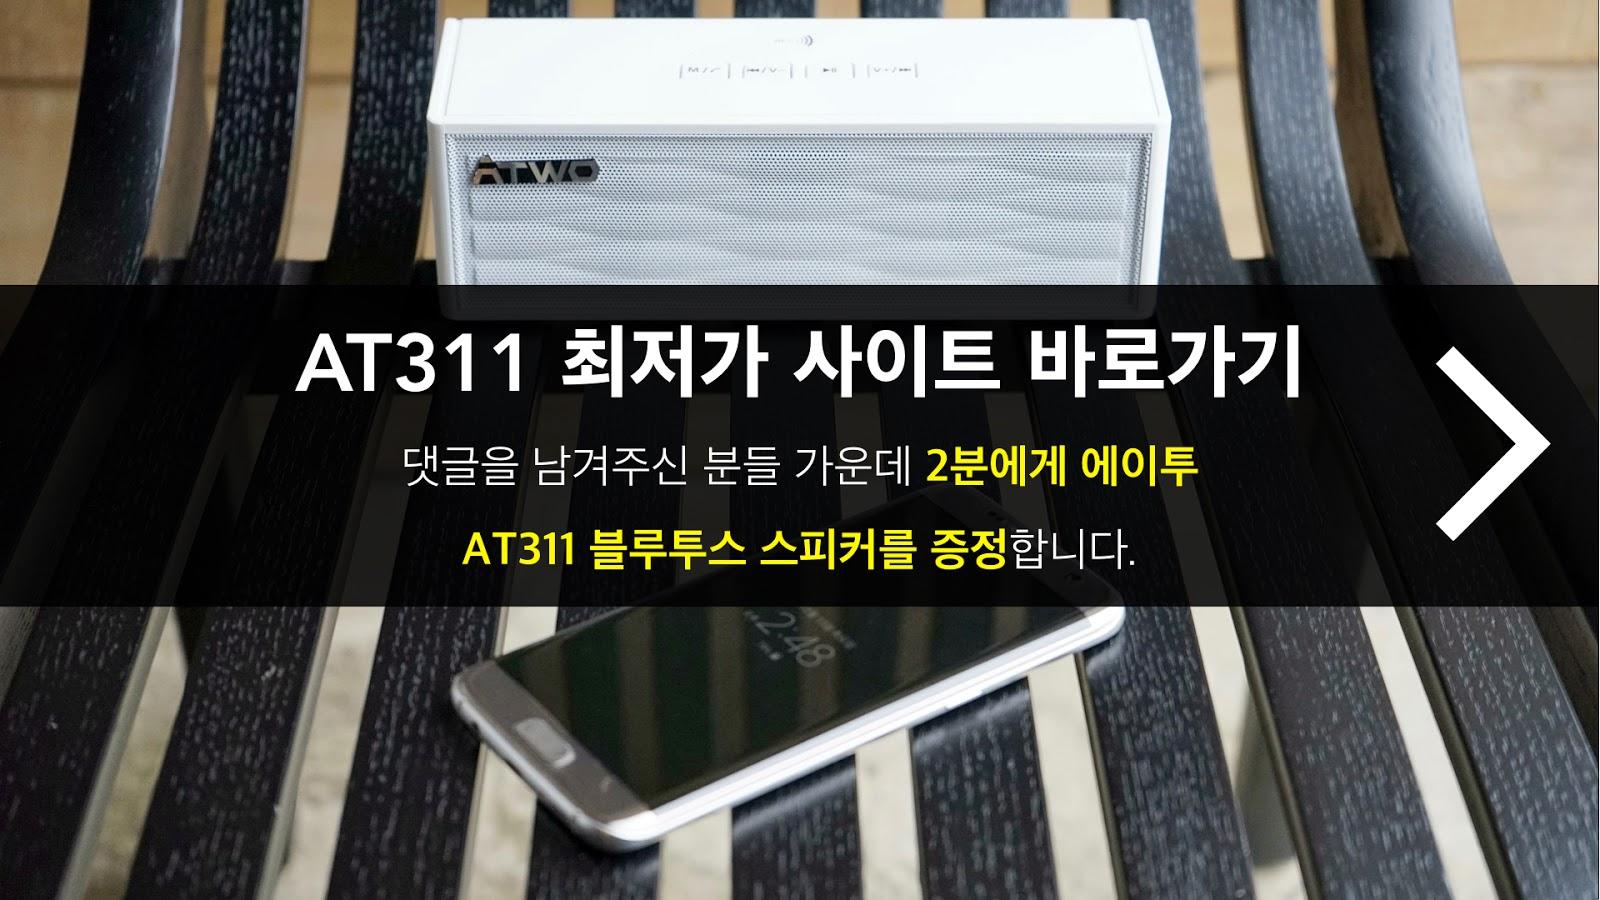 http://storefarm.naver.com/atwofarm/products/334320812